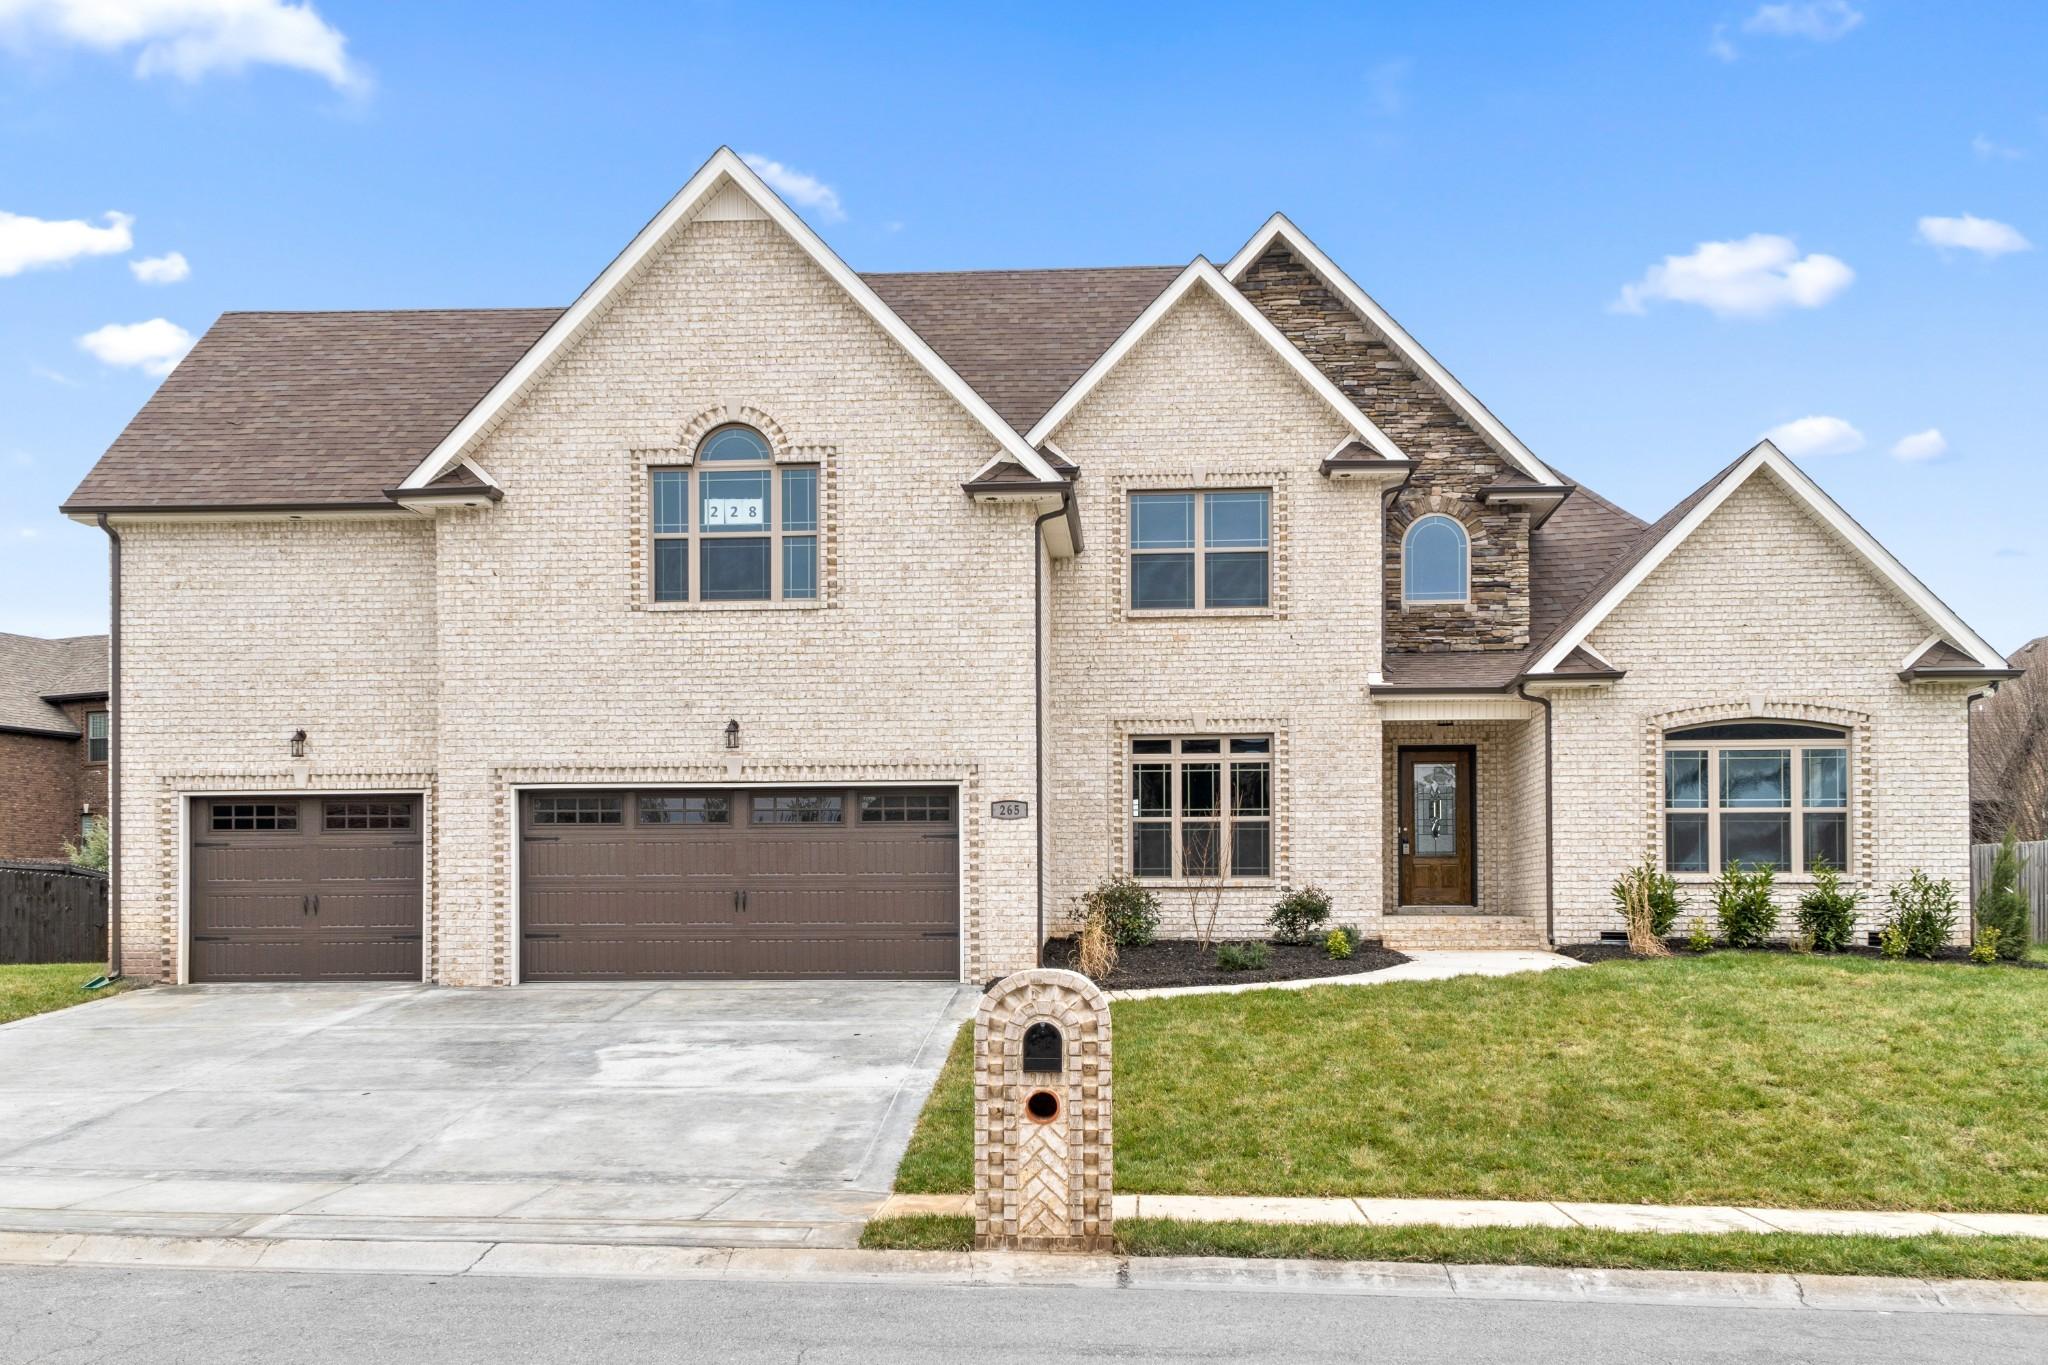 1246 Highgrove Ln Lot 70 Property Photo - Clarksville, TN real estate listing